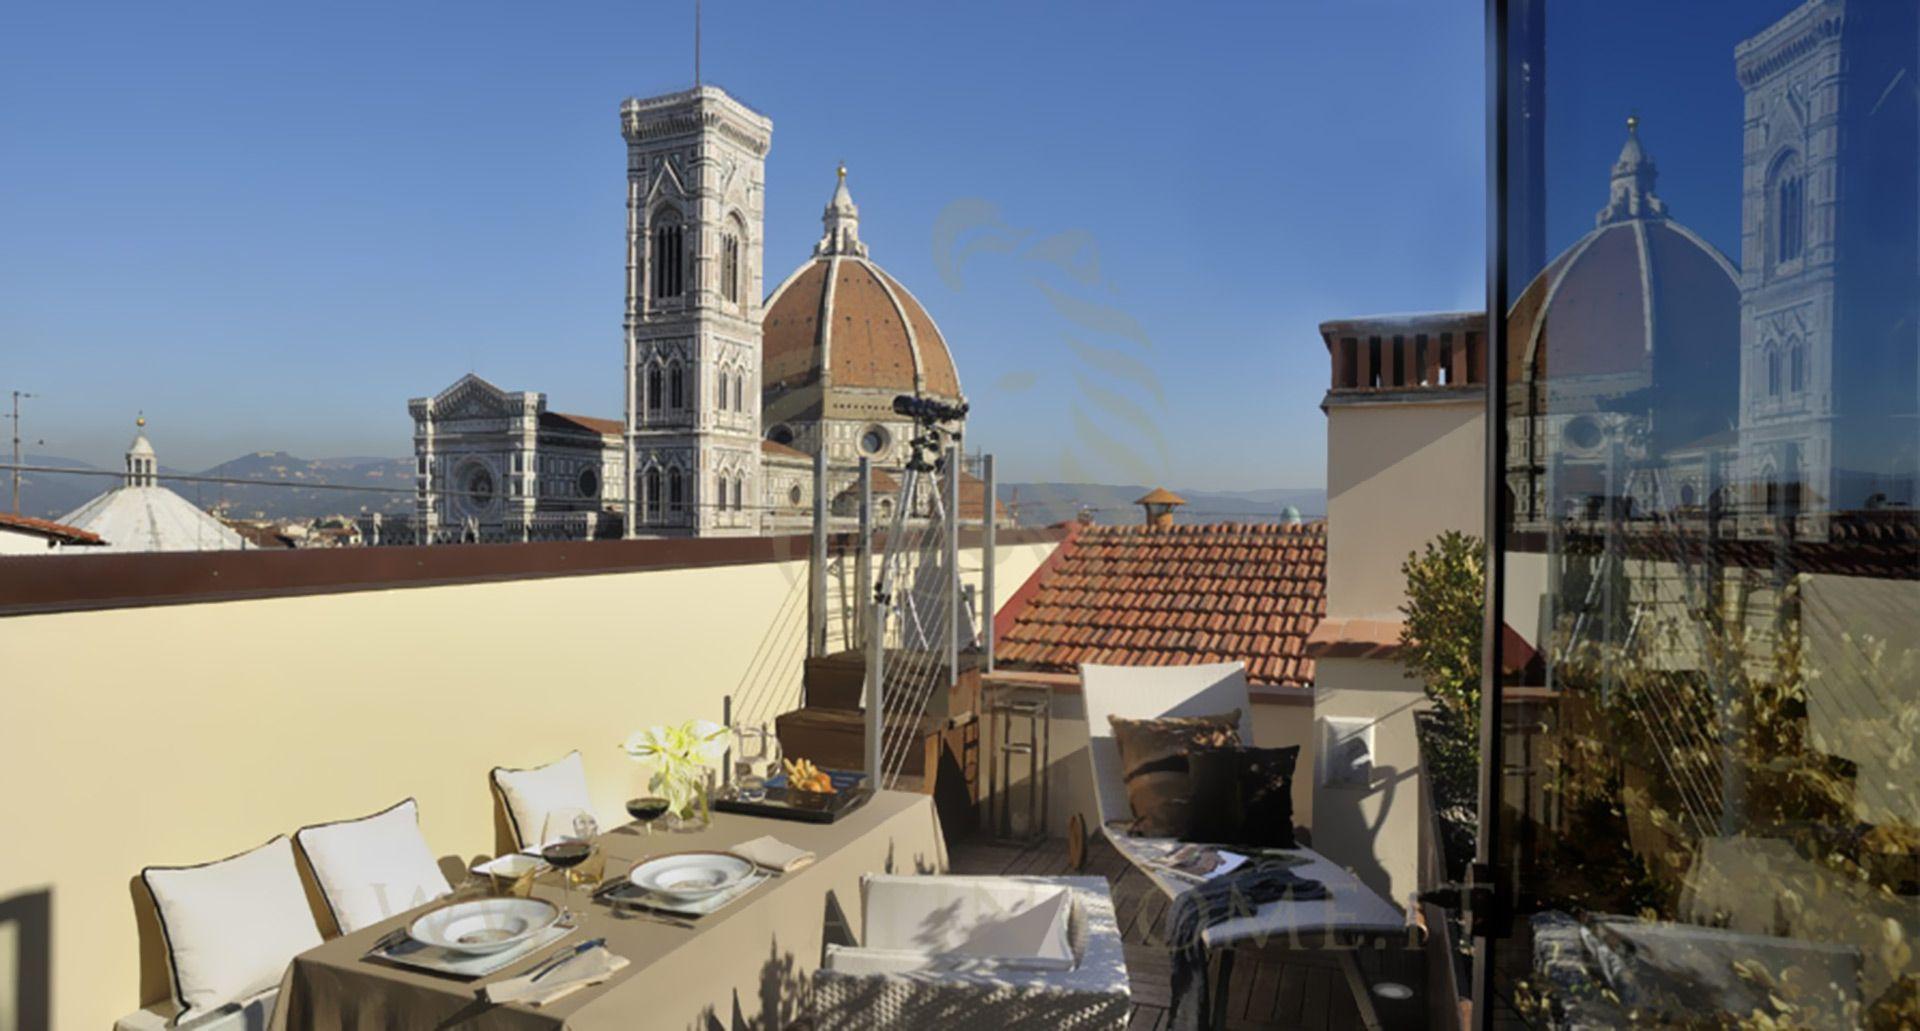 Platinhome Firenze (FI) - Official reservation system ;-)